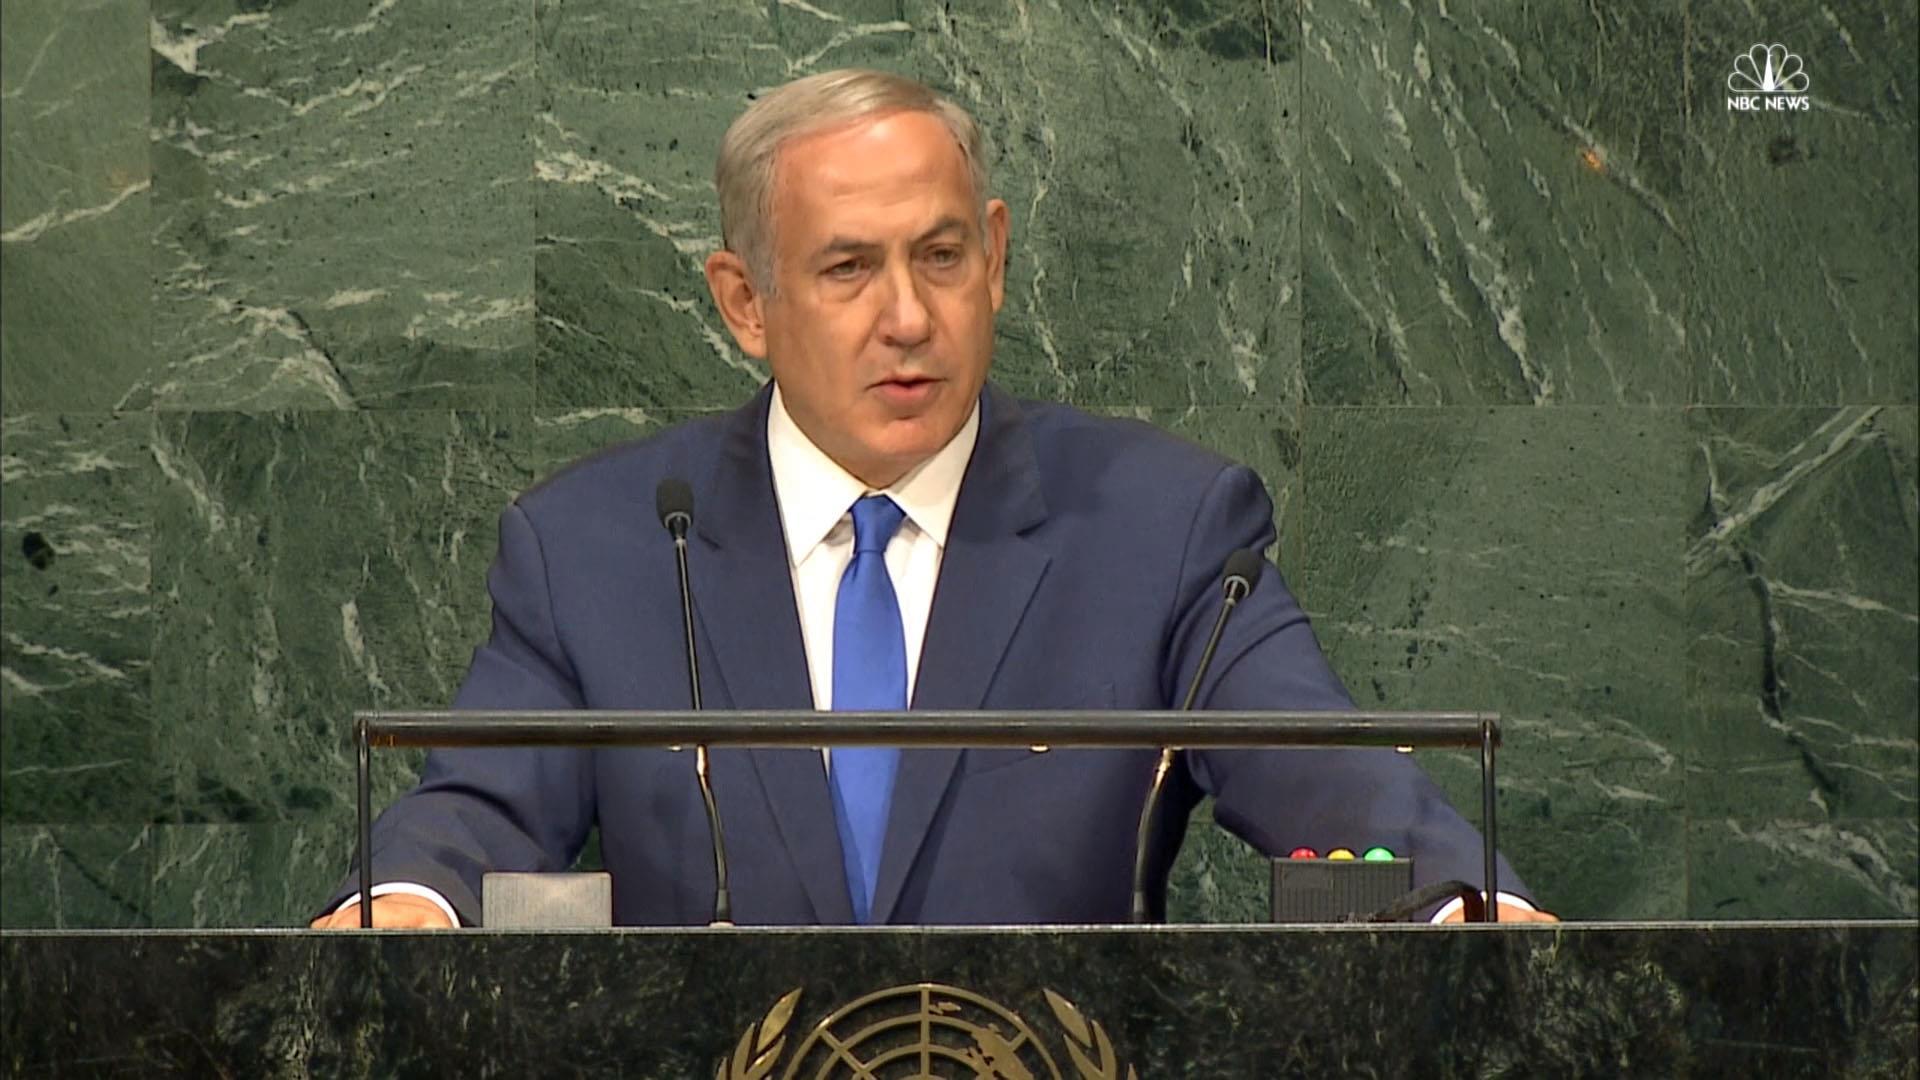 Netanyahu: U.N. Will Not Dictate Terms to Israel